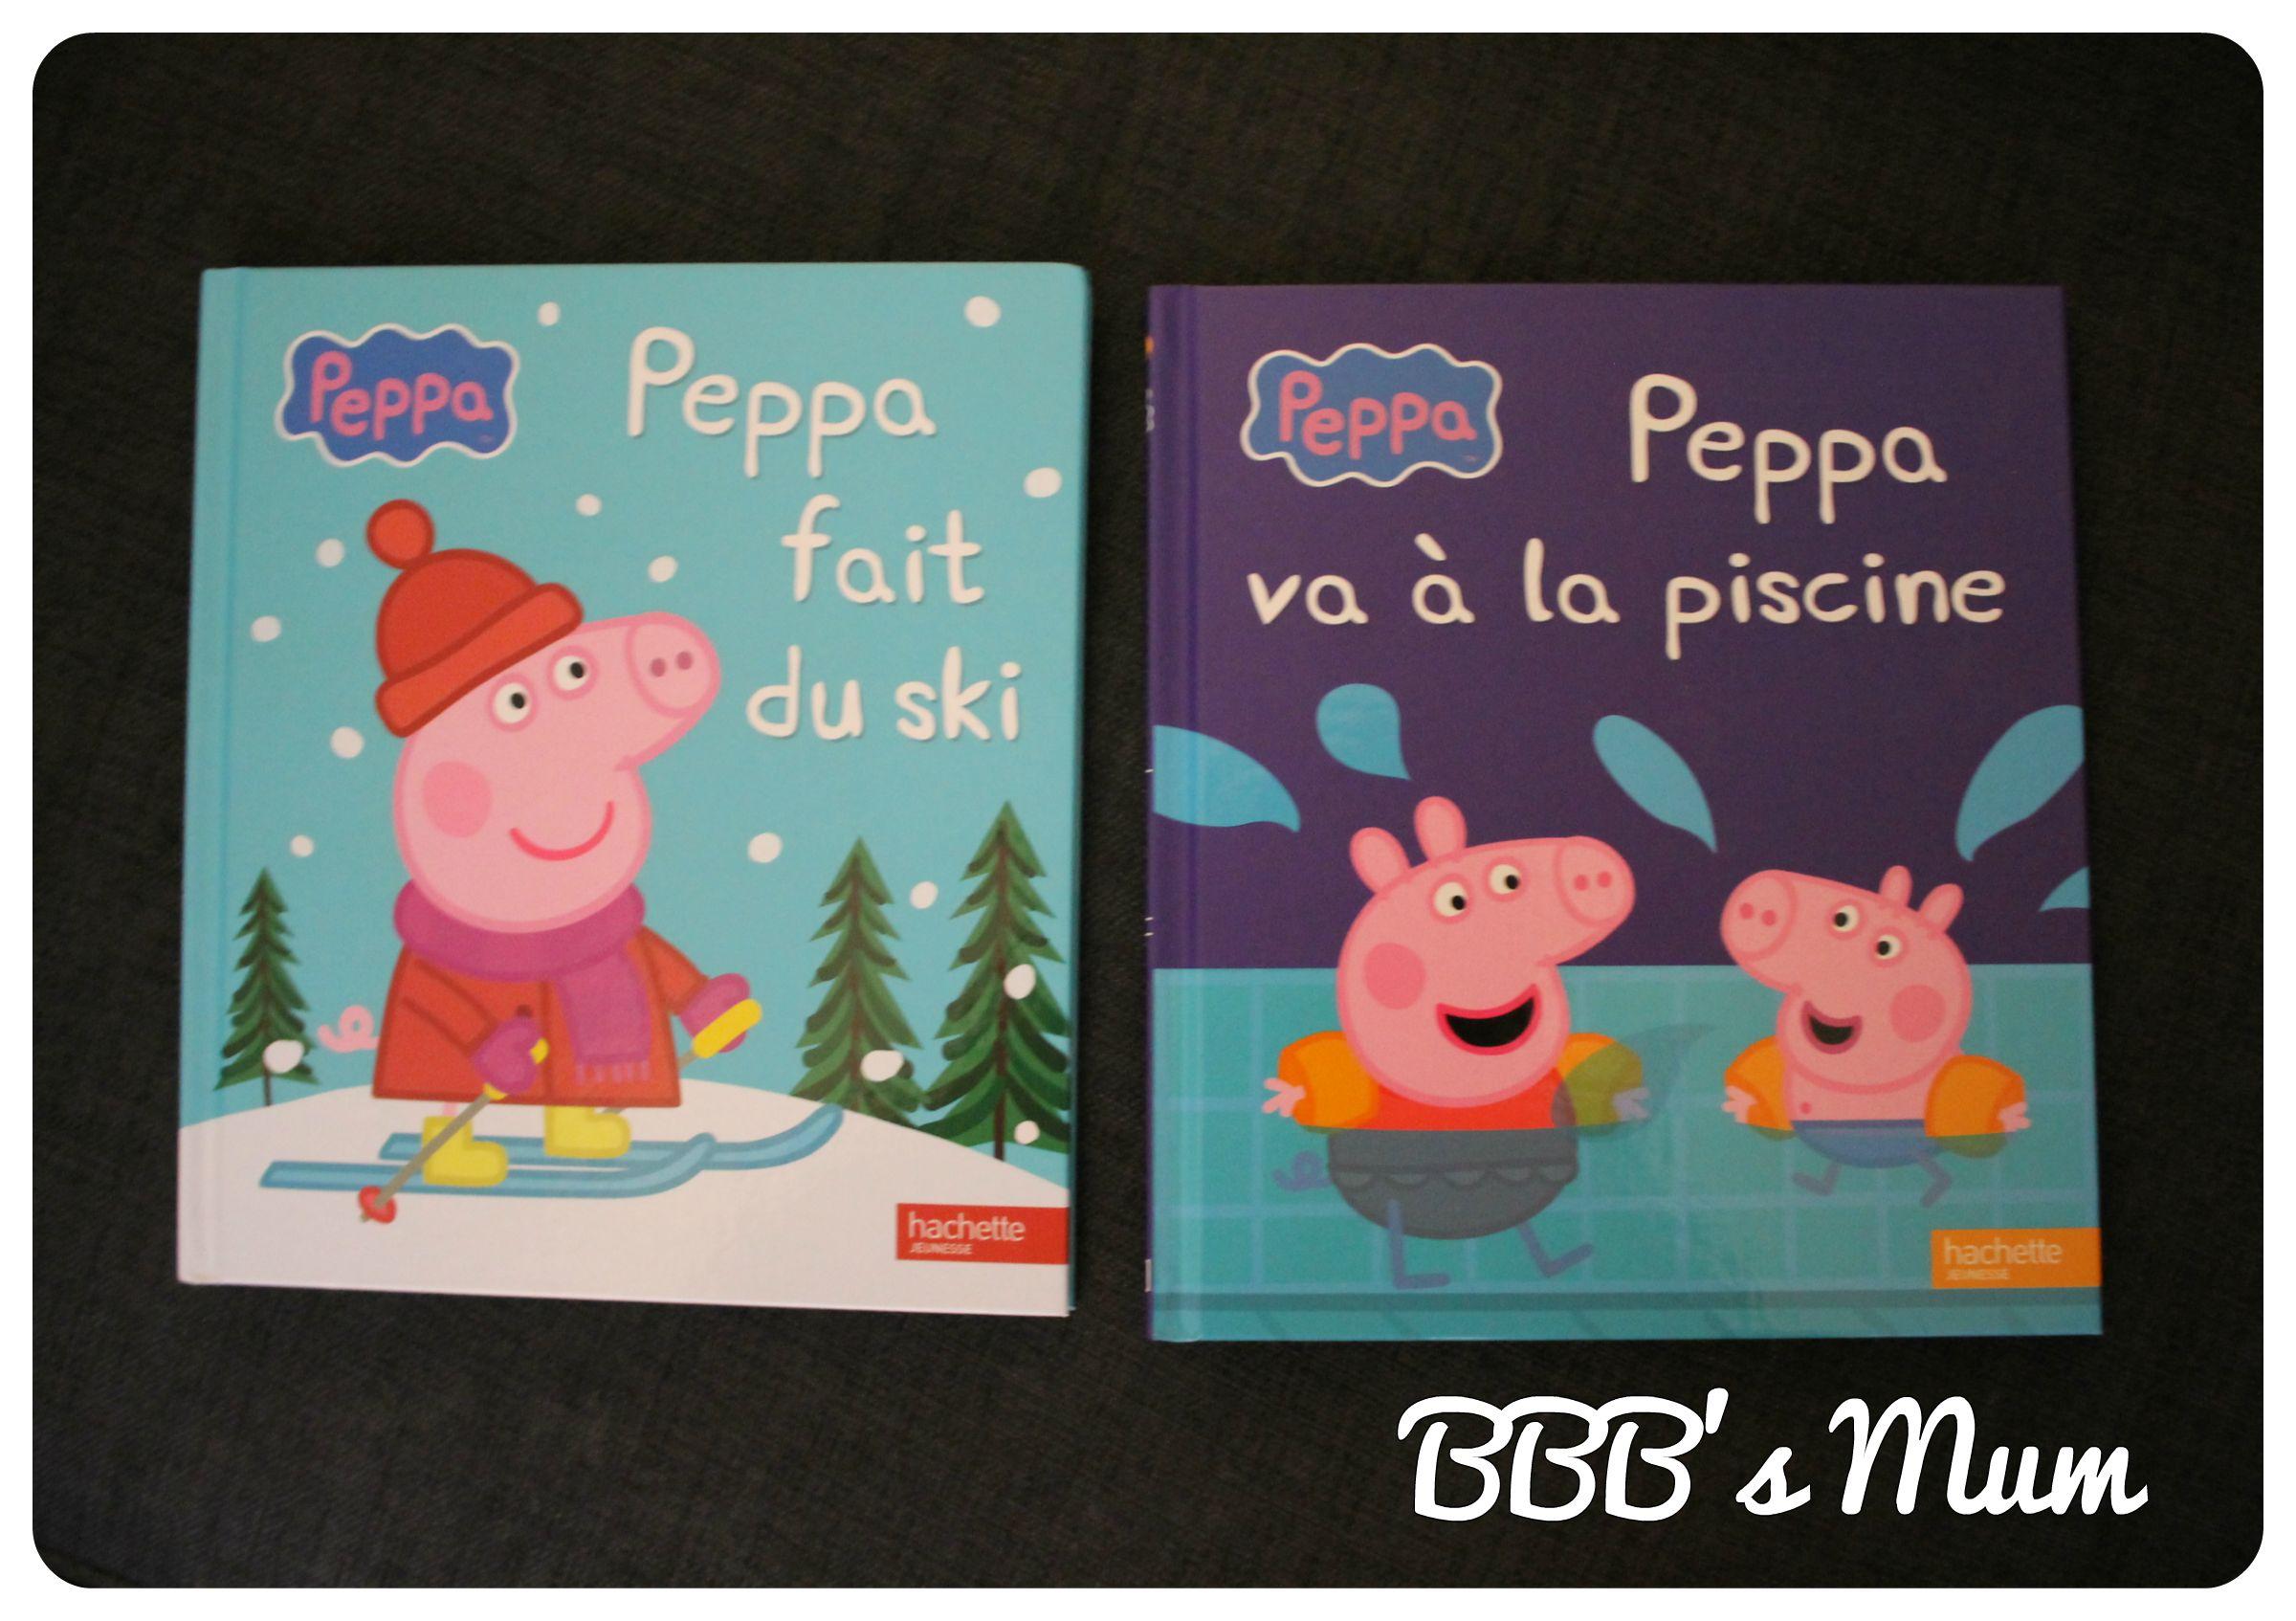 Peppa Pig Fait Son Entree Dans Notre Bibliotheque Bbb S Mum